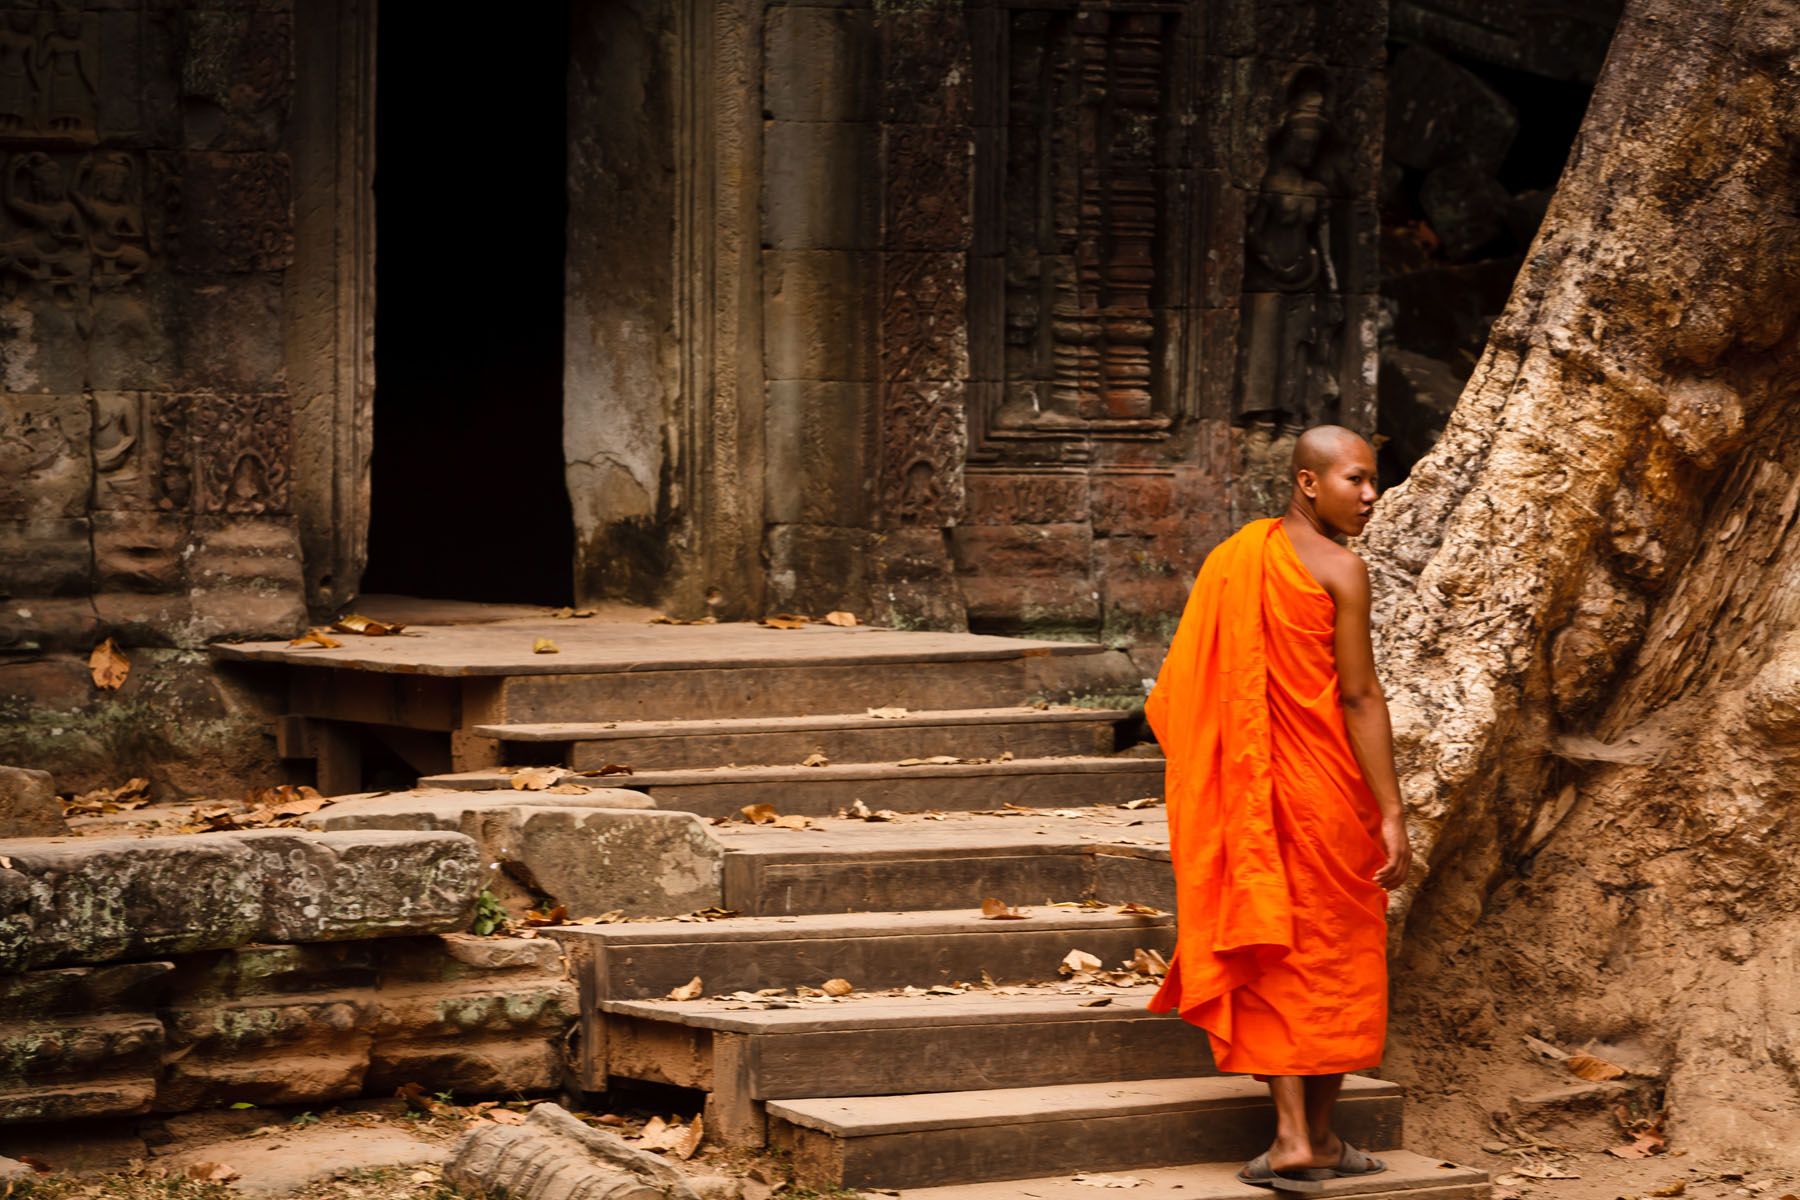 Cambodia-Siem Reap_107576144